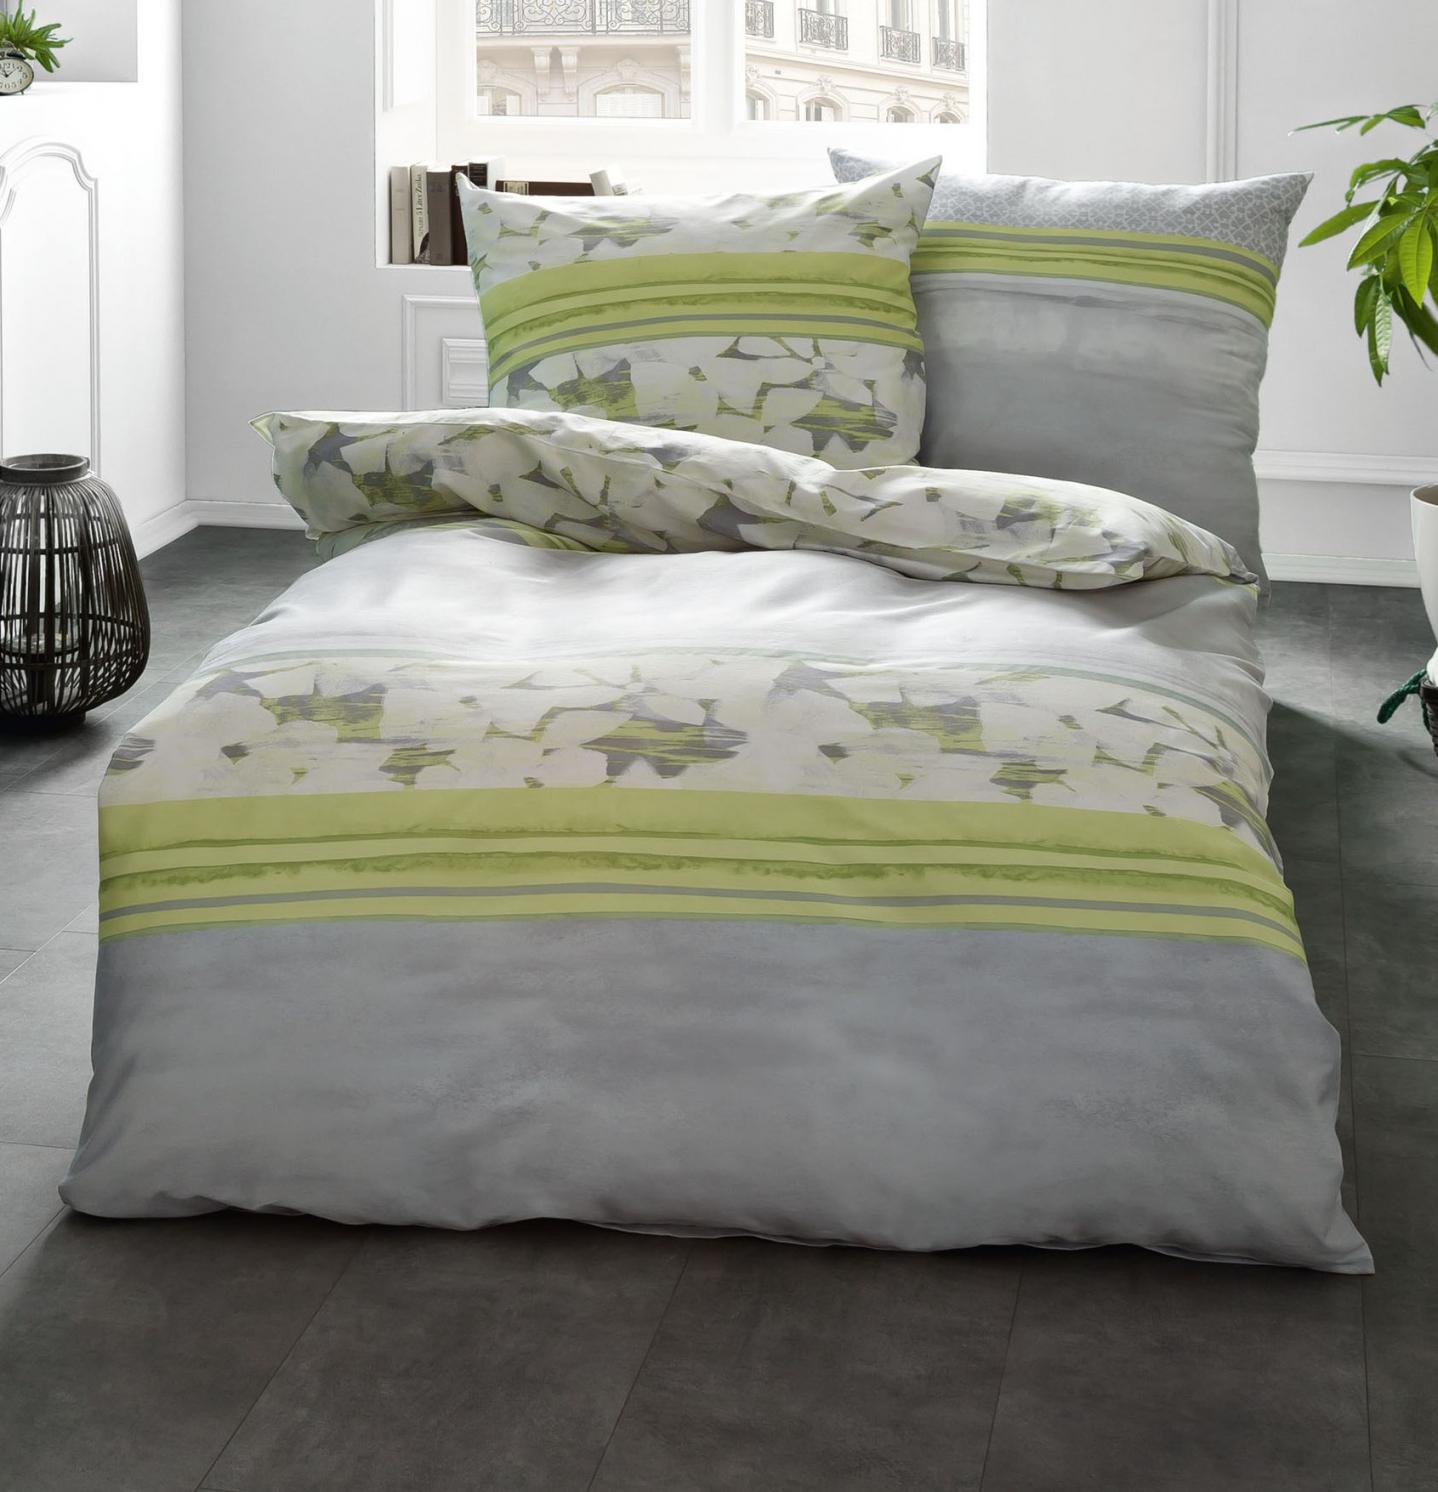 Vibrant Idea Bettwasche Bedrucken Lassen  Wwwkhoddam von Bettwäsche Bedrucken Lassen 155X220 Photo